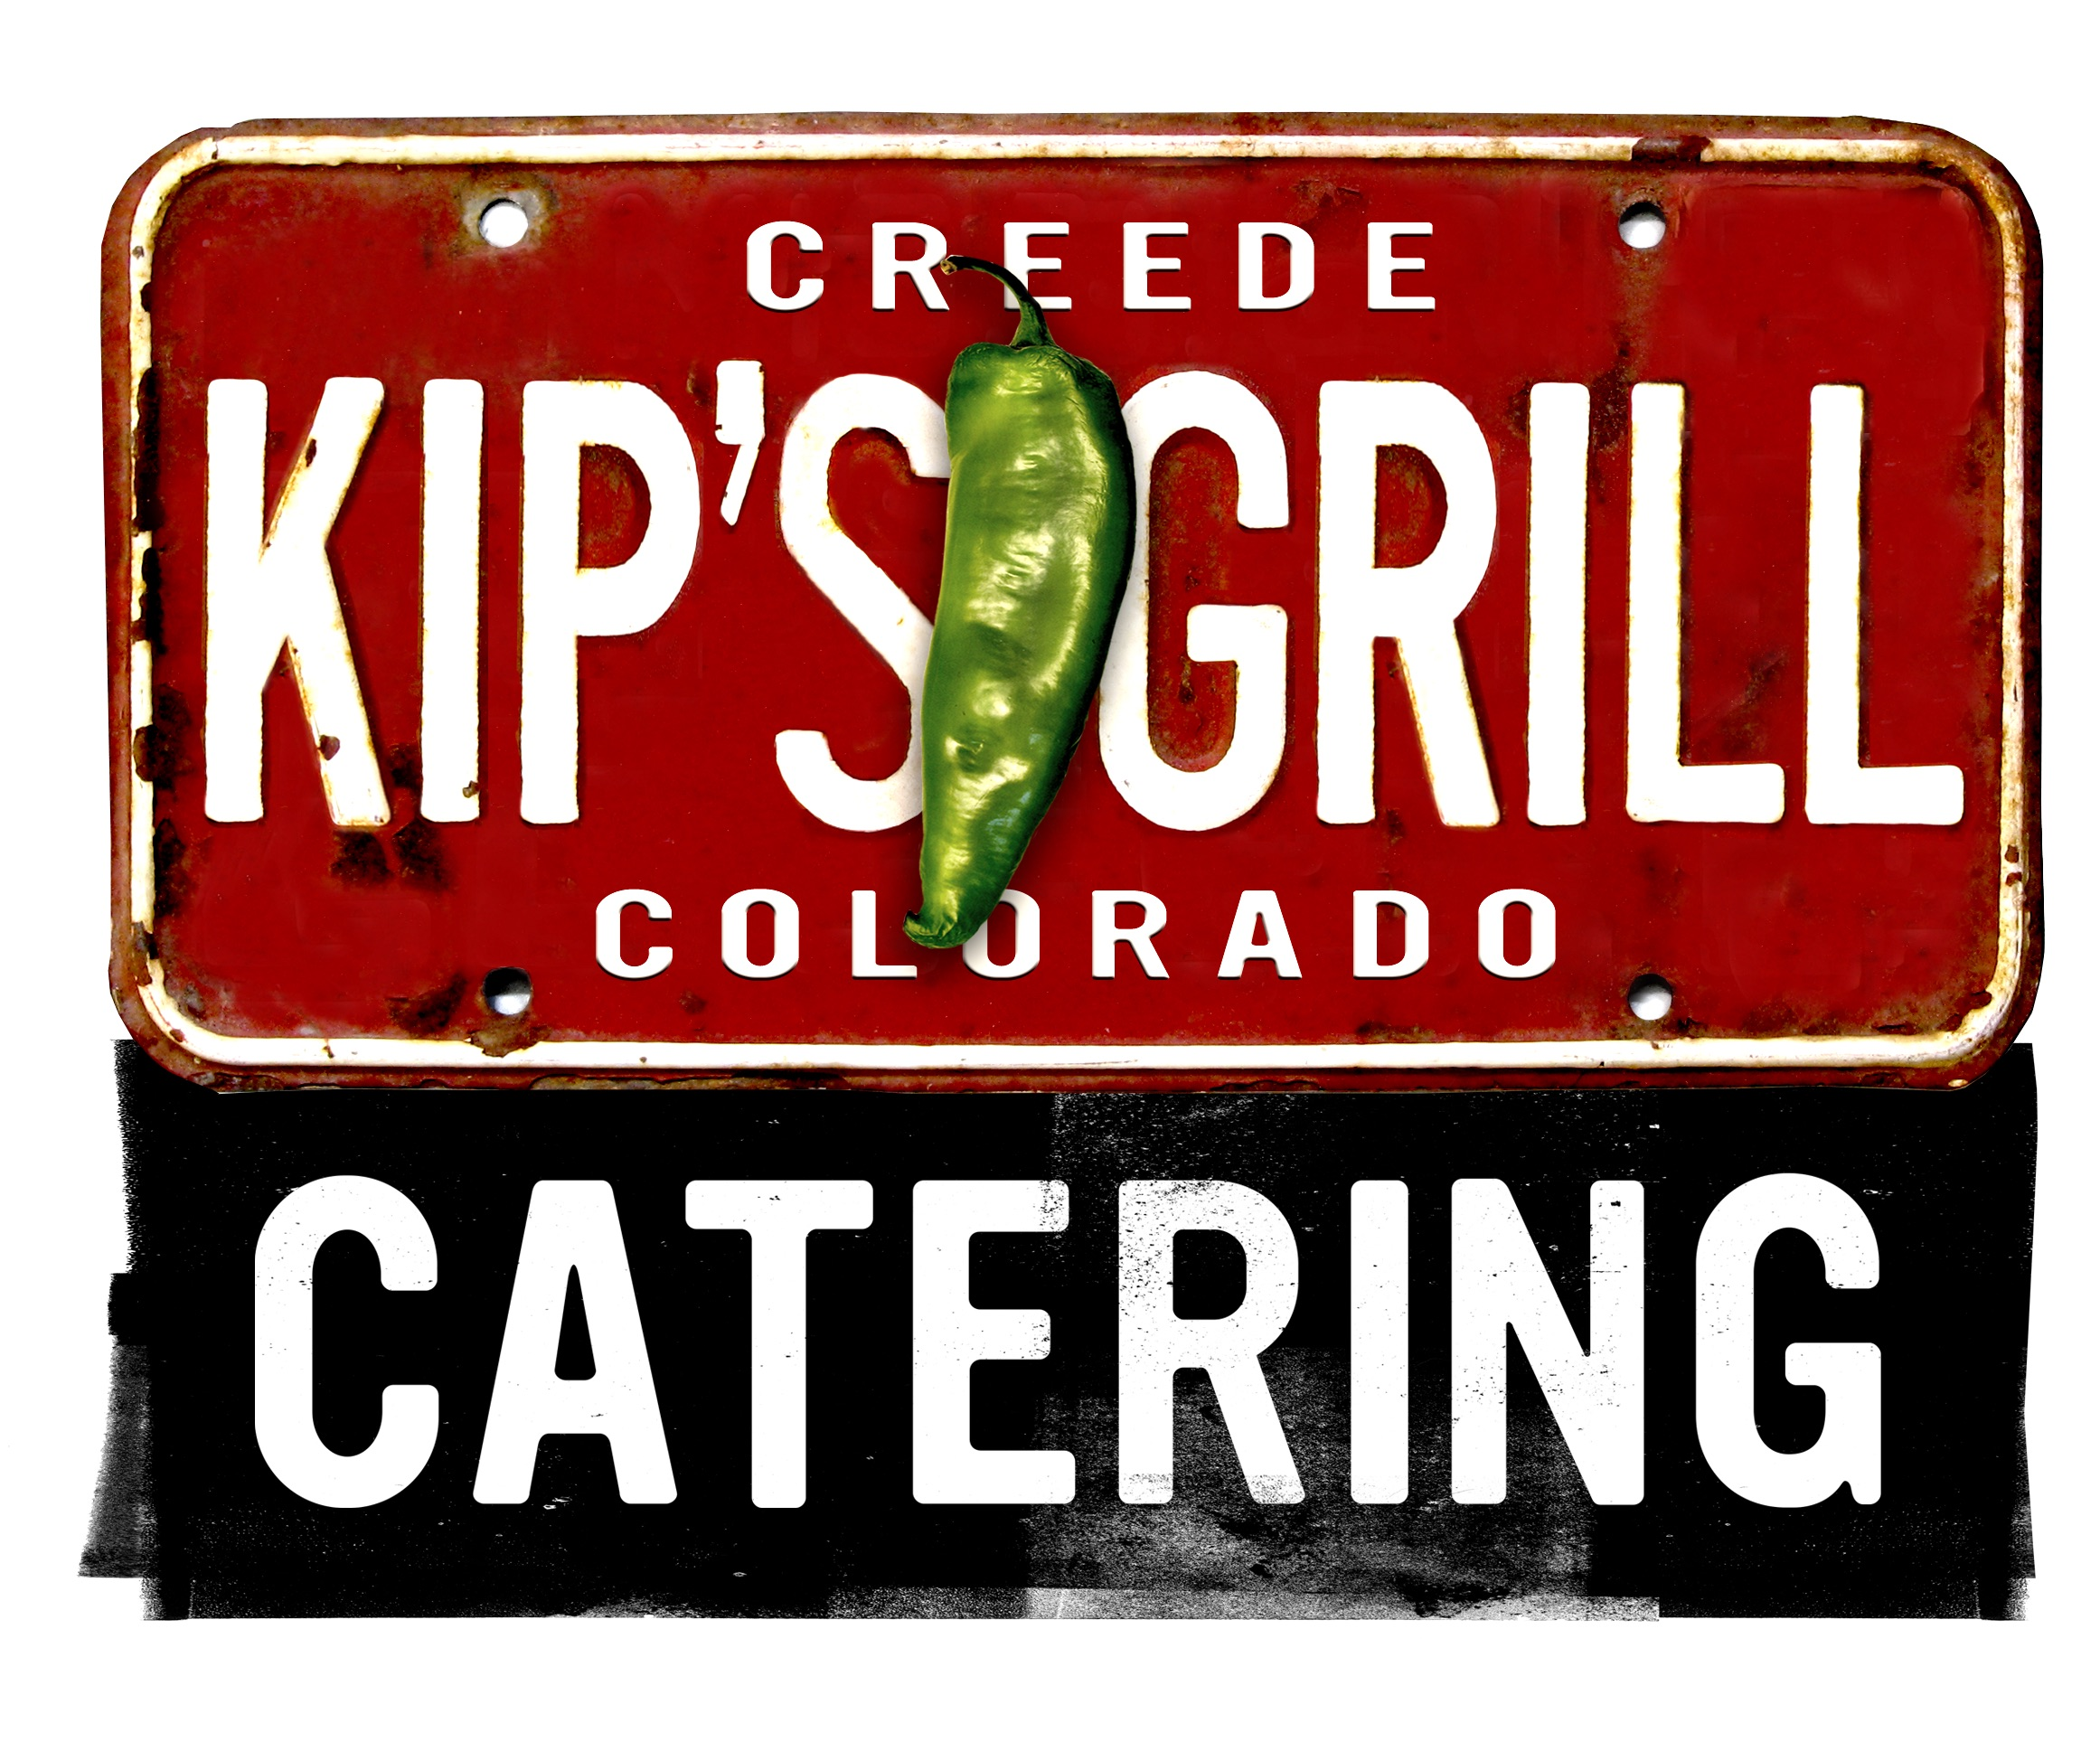 KG_Catering.jpg